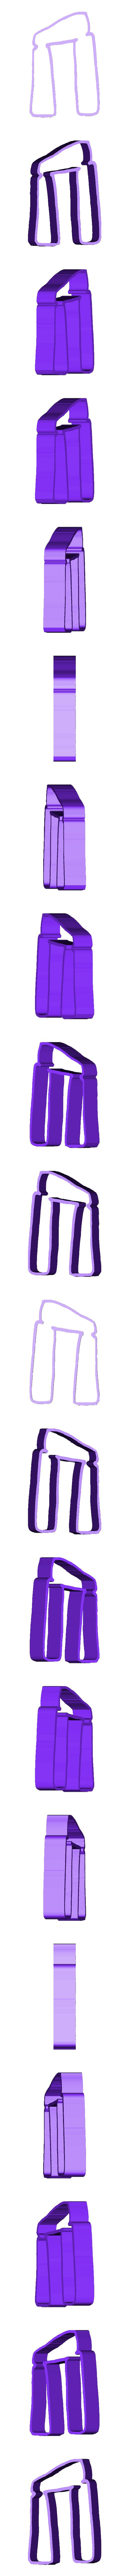 Stonehenge_2.stl Download free STL file Stonehenge cookie cutter • 3D printer model, poblocki1982